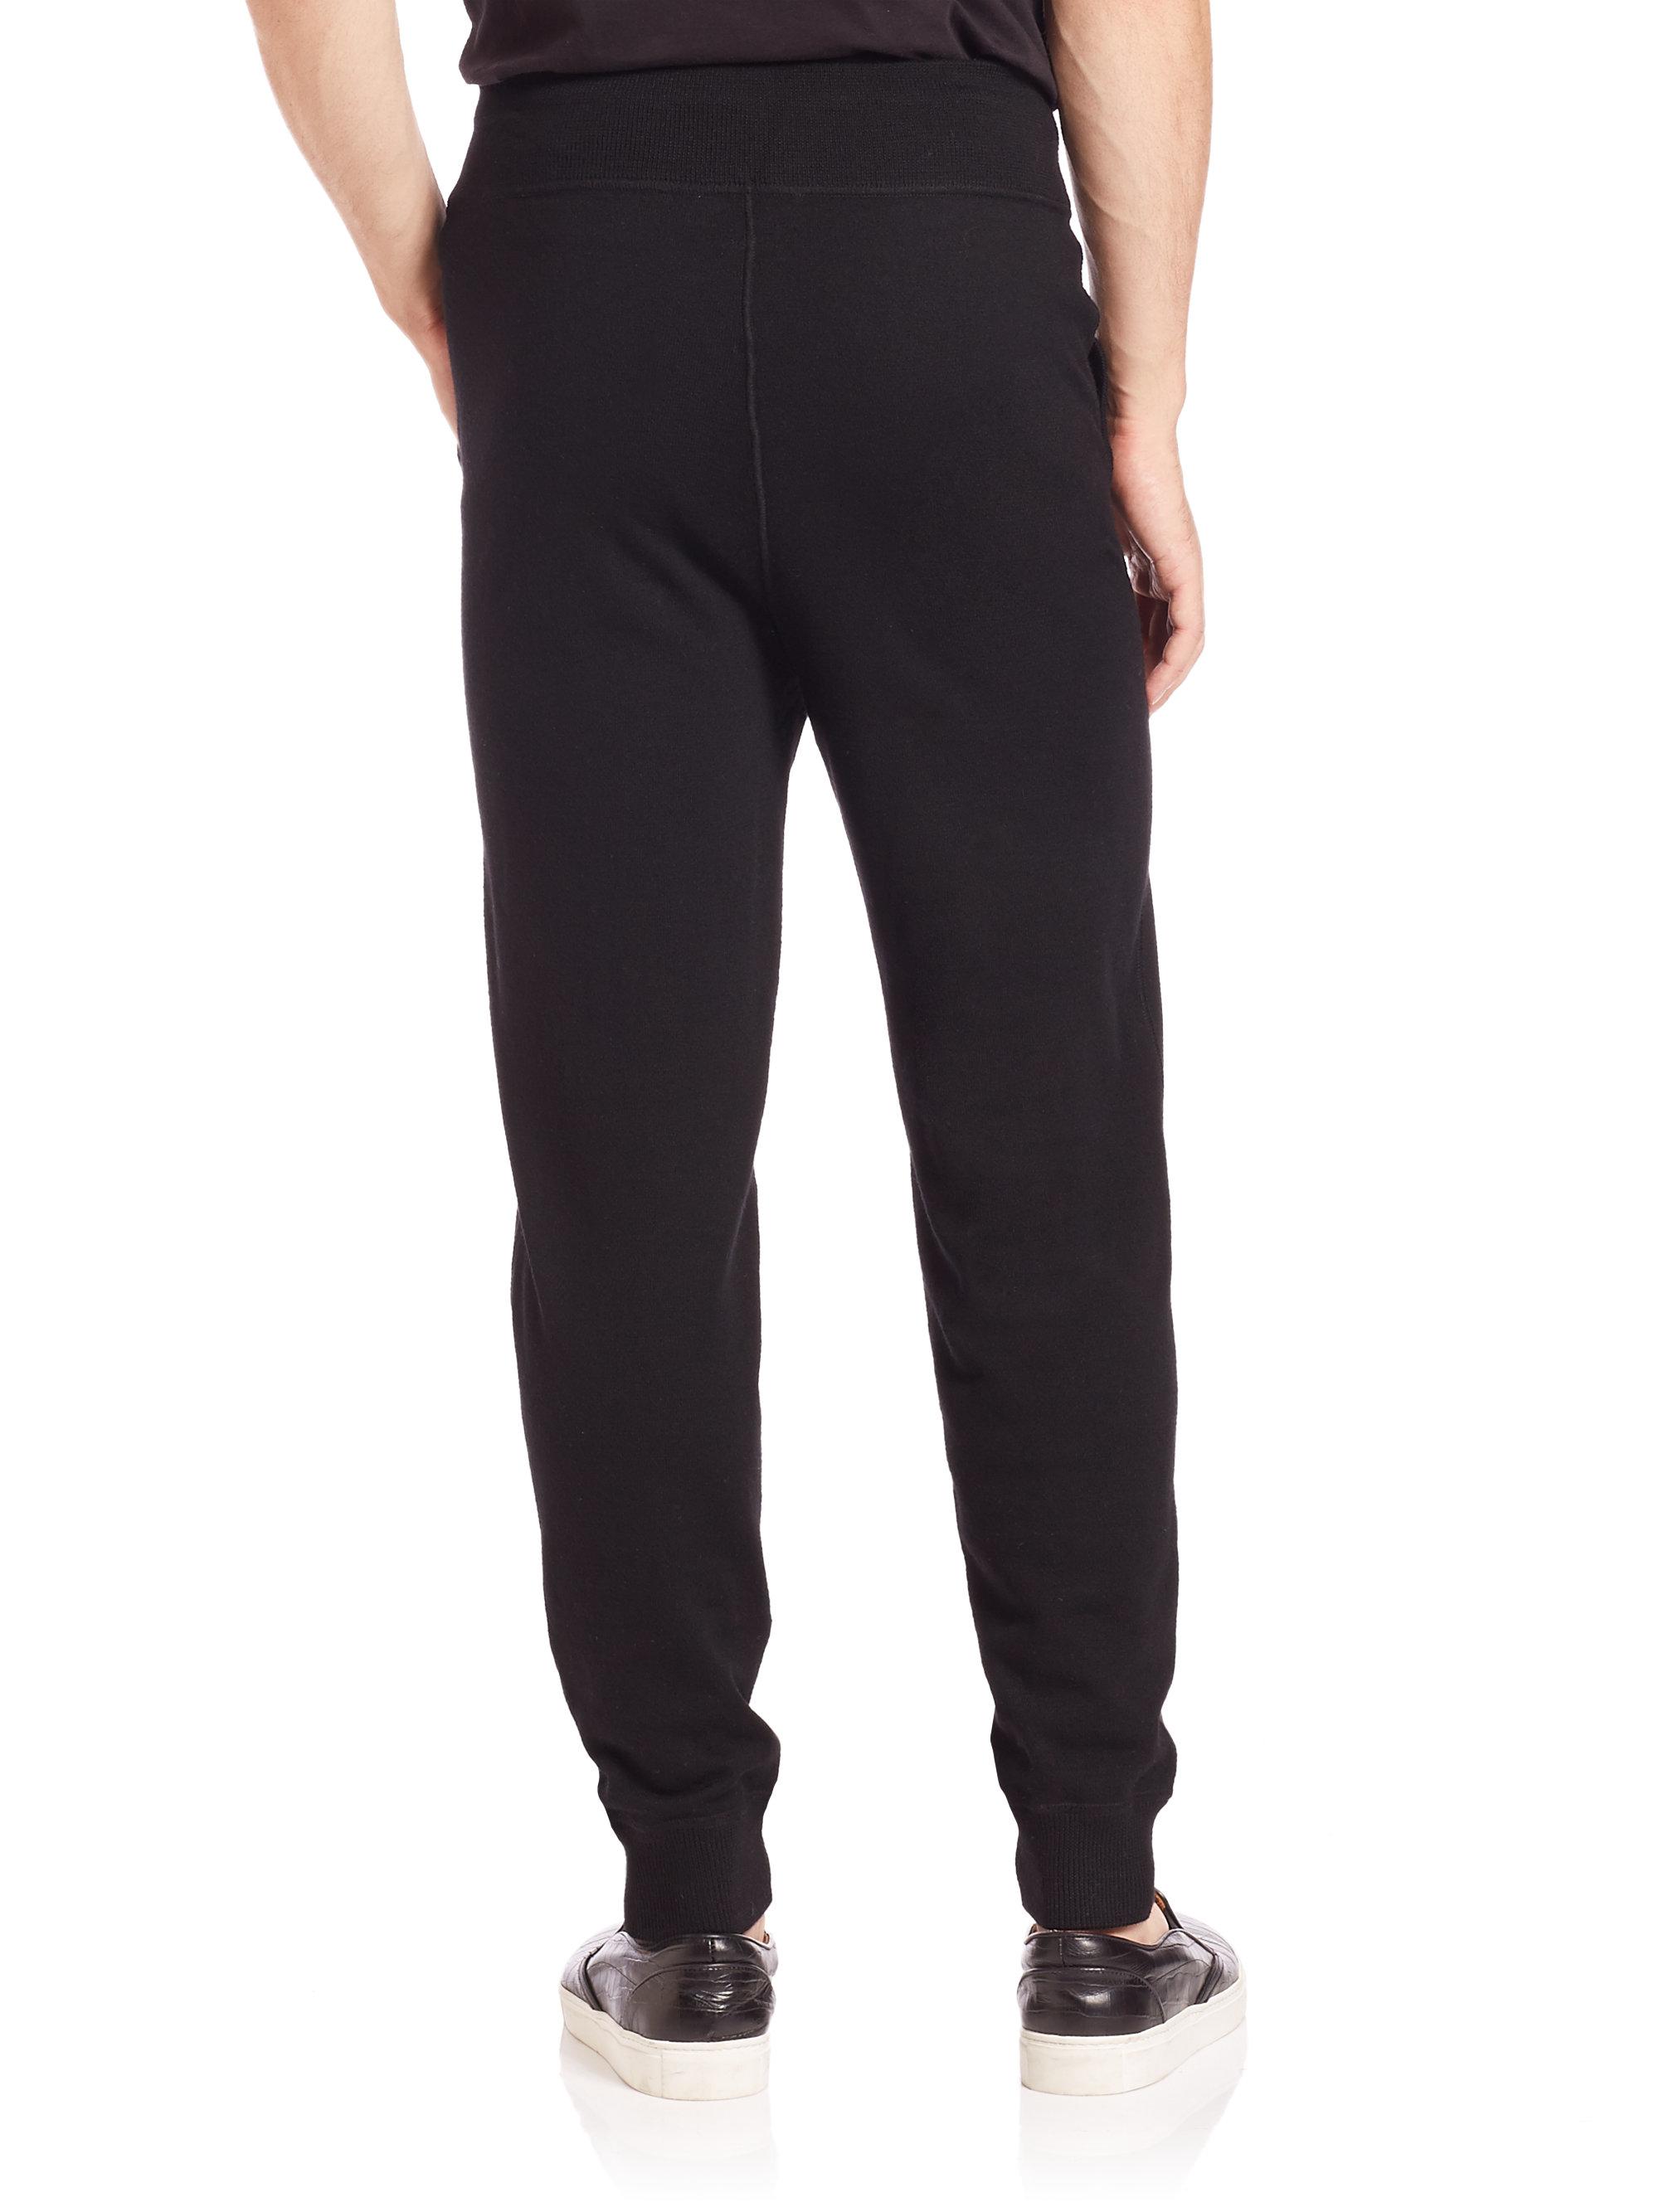 Lyst Polo Ralph Lauren Merino Wool Lounge Pants In Black For Men